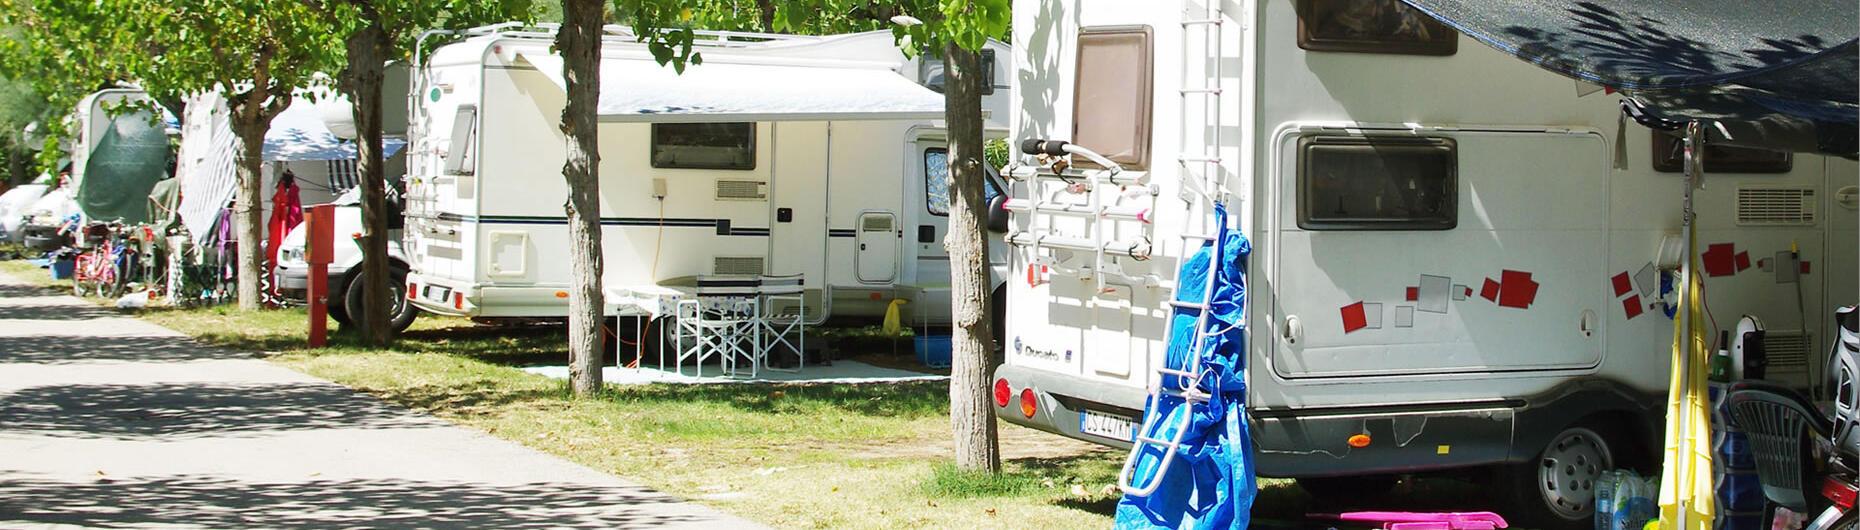 vacanzespinnaker it campeggi-nelle-marche 005